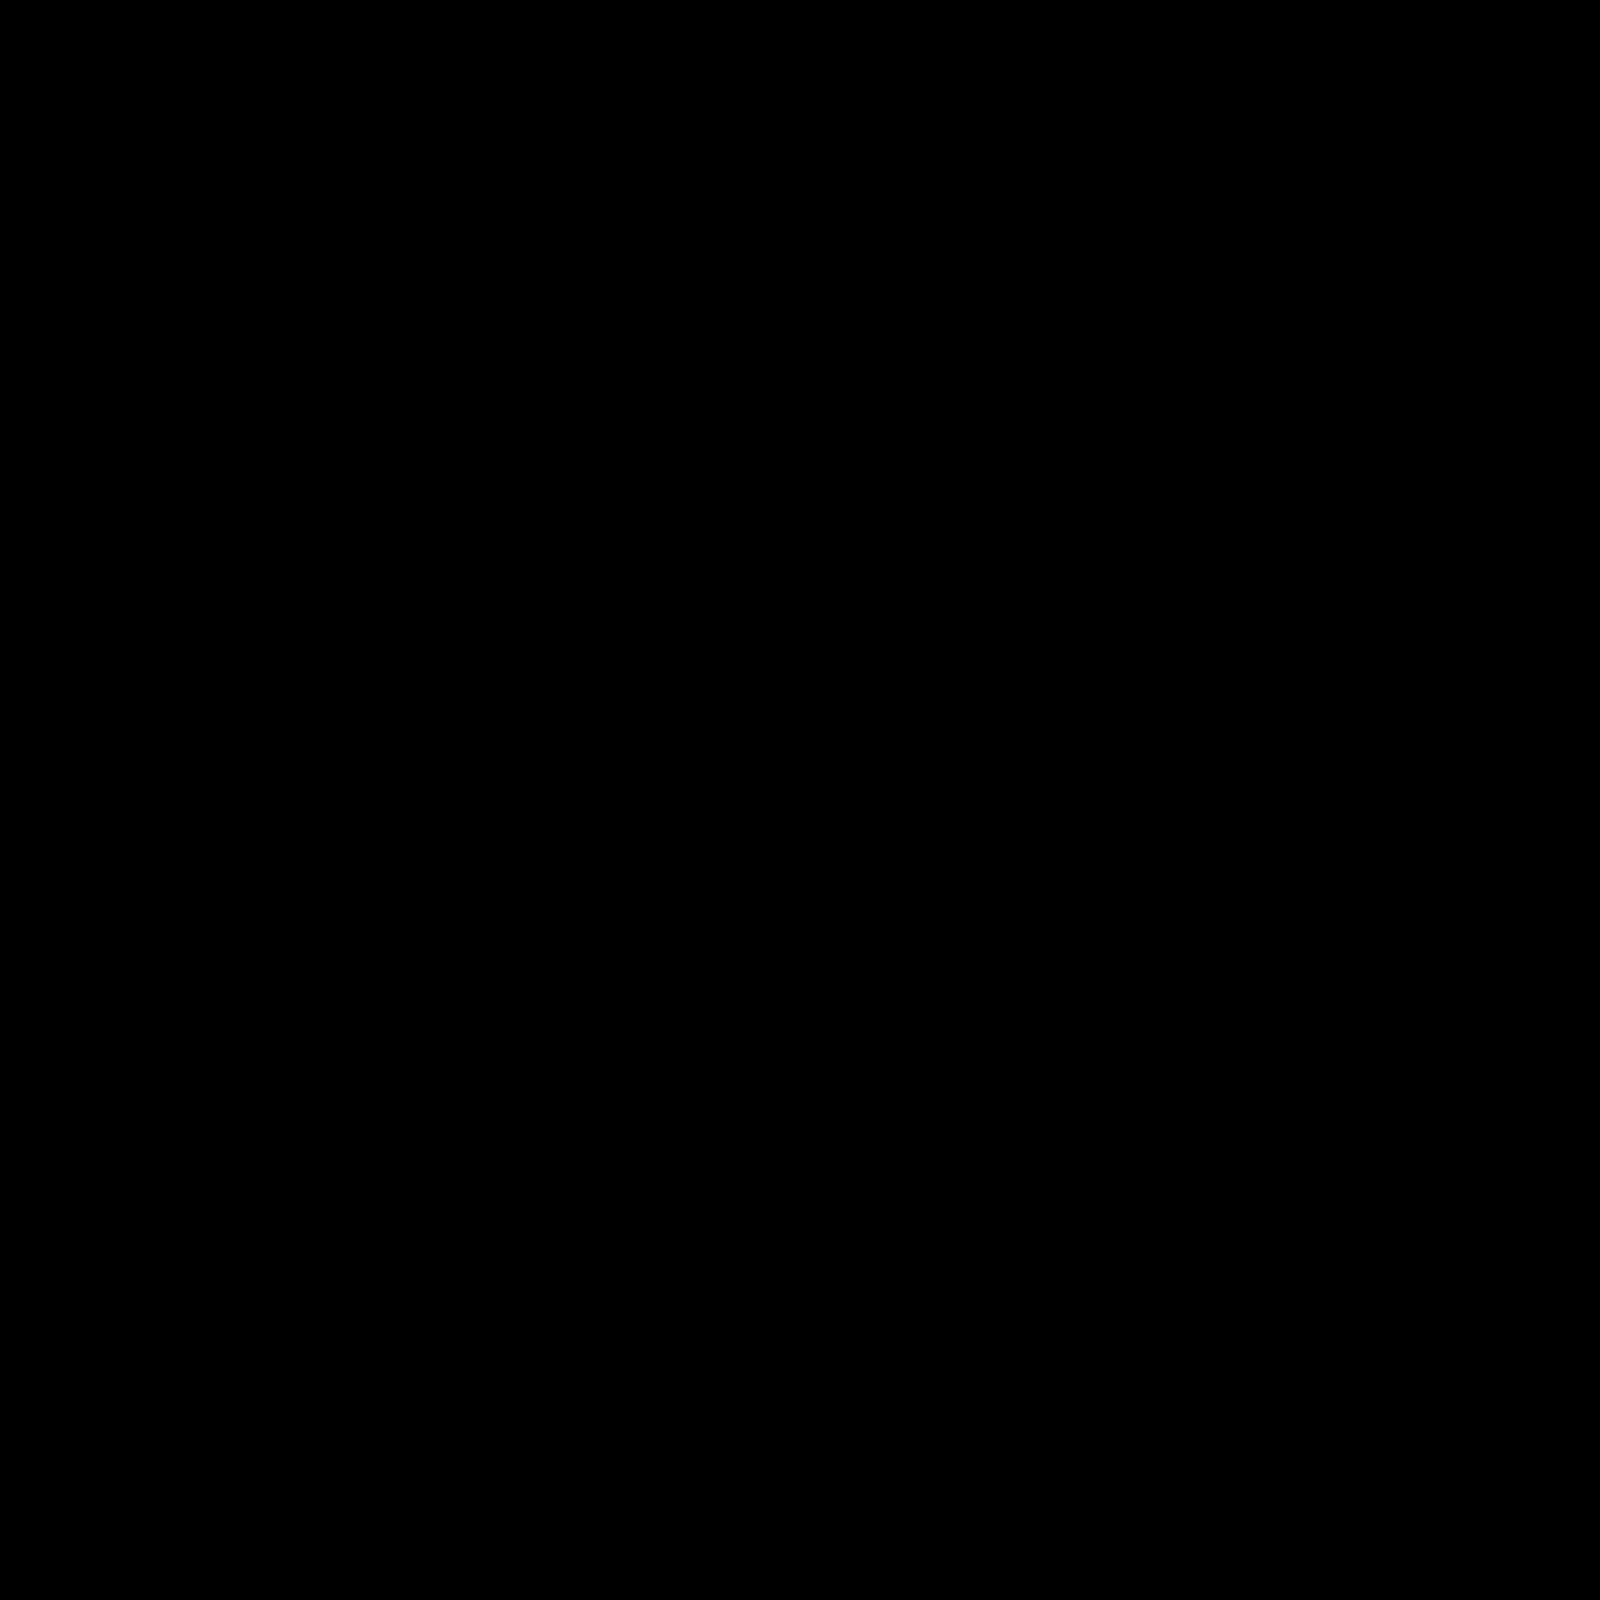 Qbittorrent Icon at GetDrawings com | Free Qbittorrent Icon